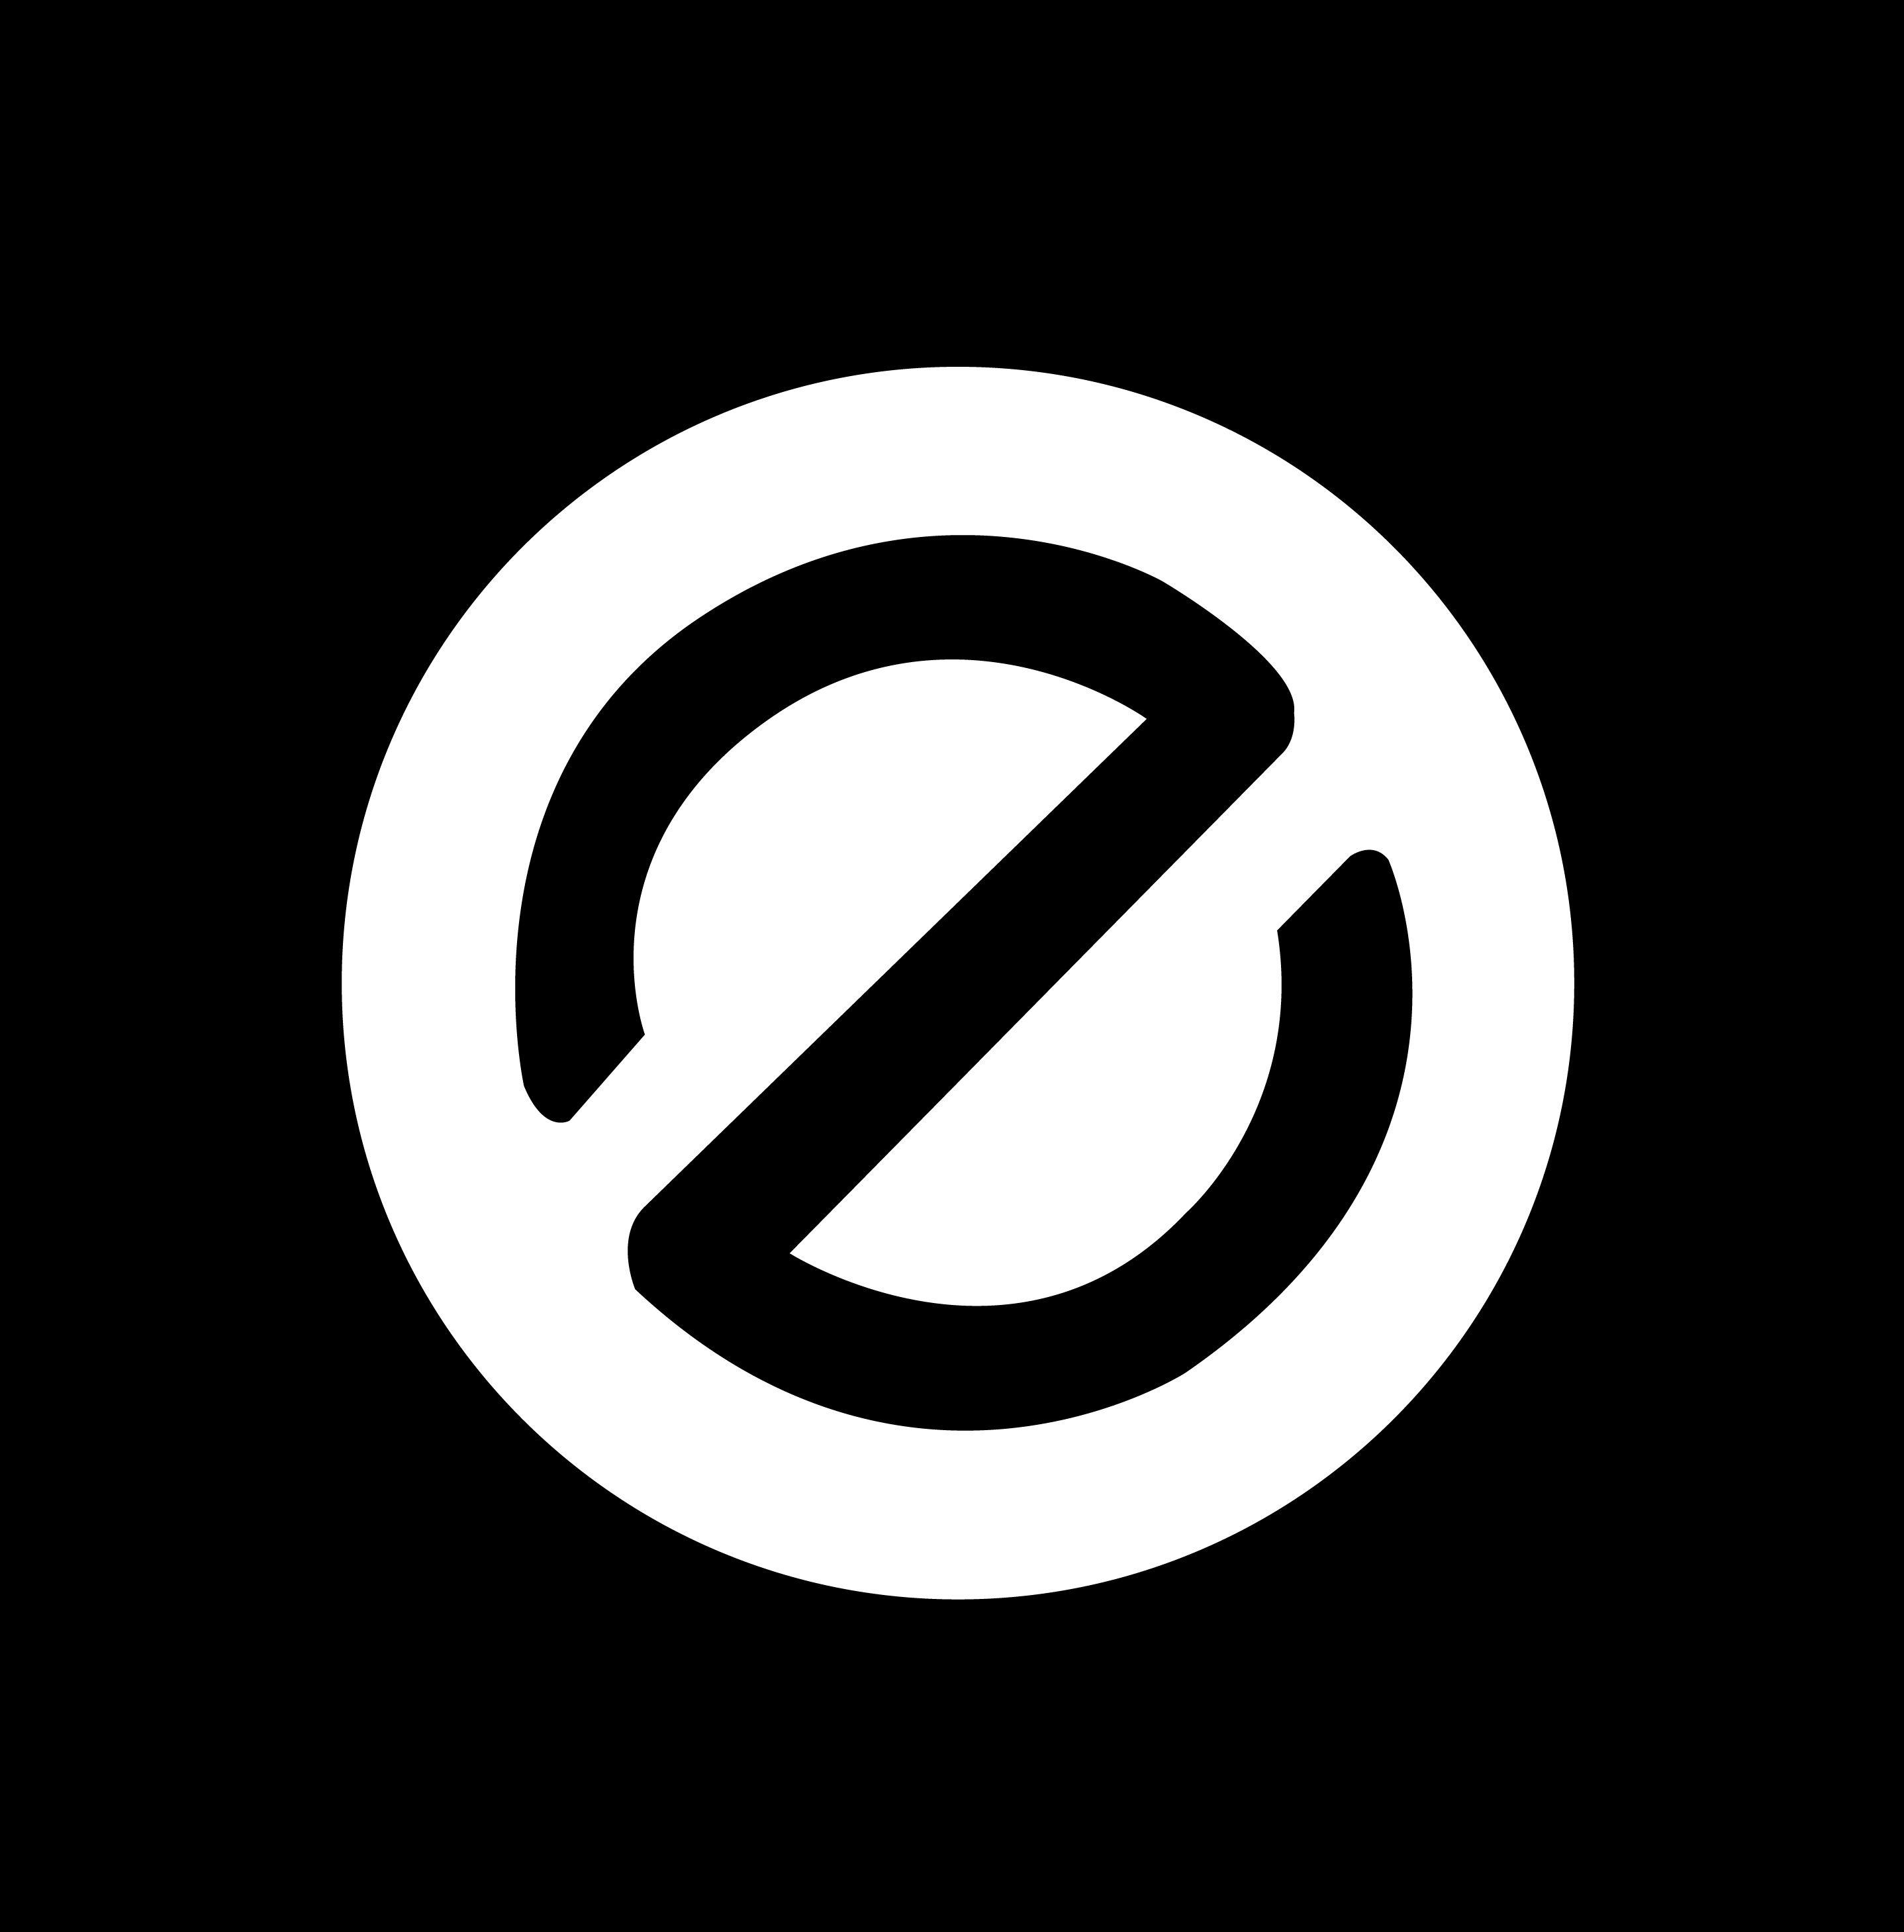 E monogram logotipo logo design diseño E letter (Dengan